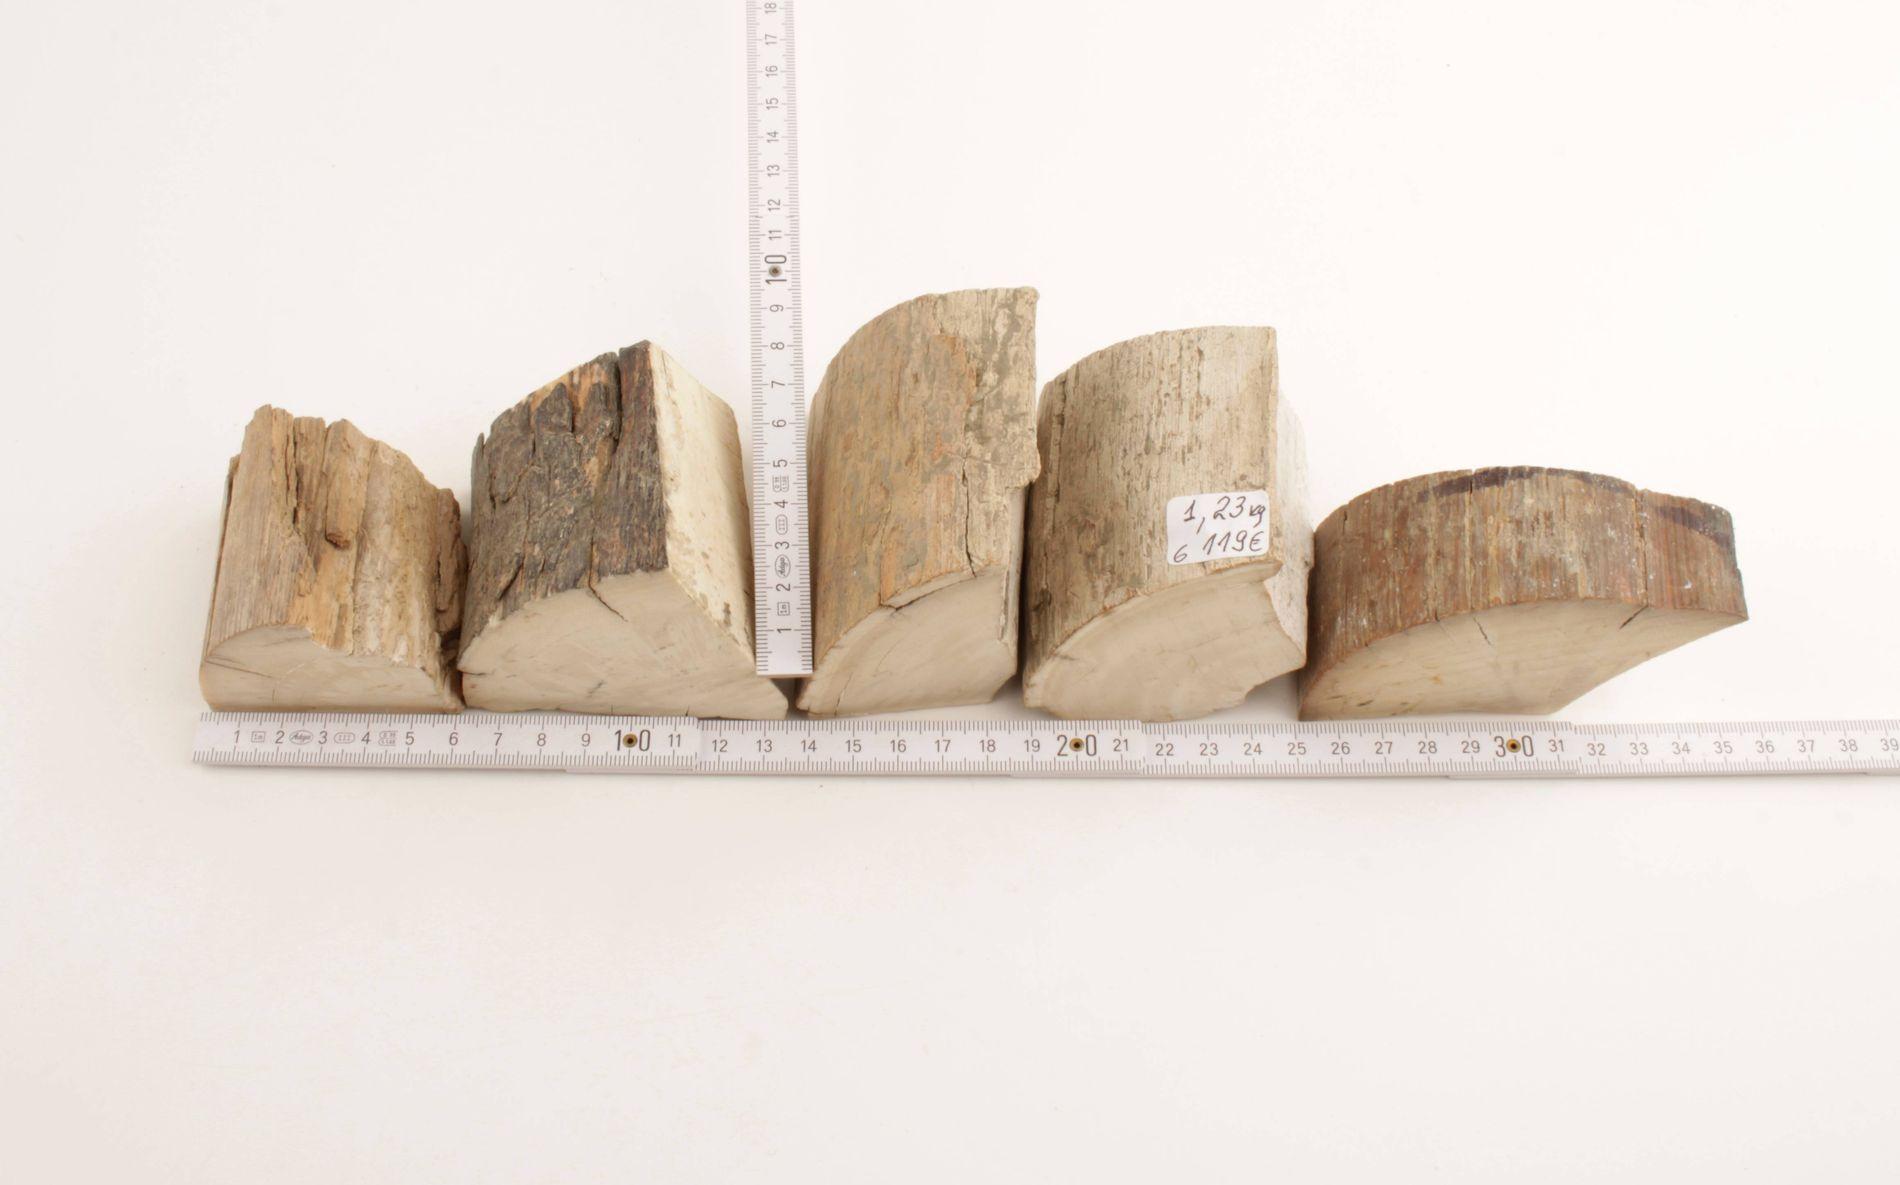 Raw mammoth ivory offcuts